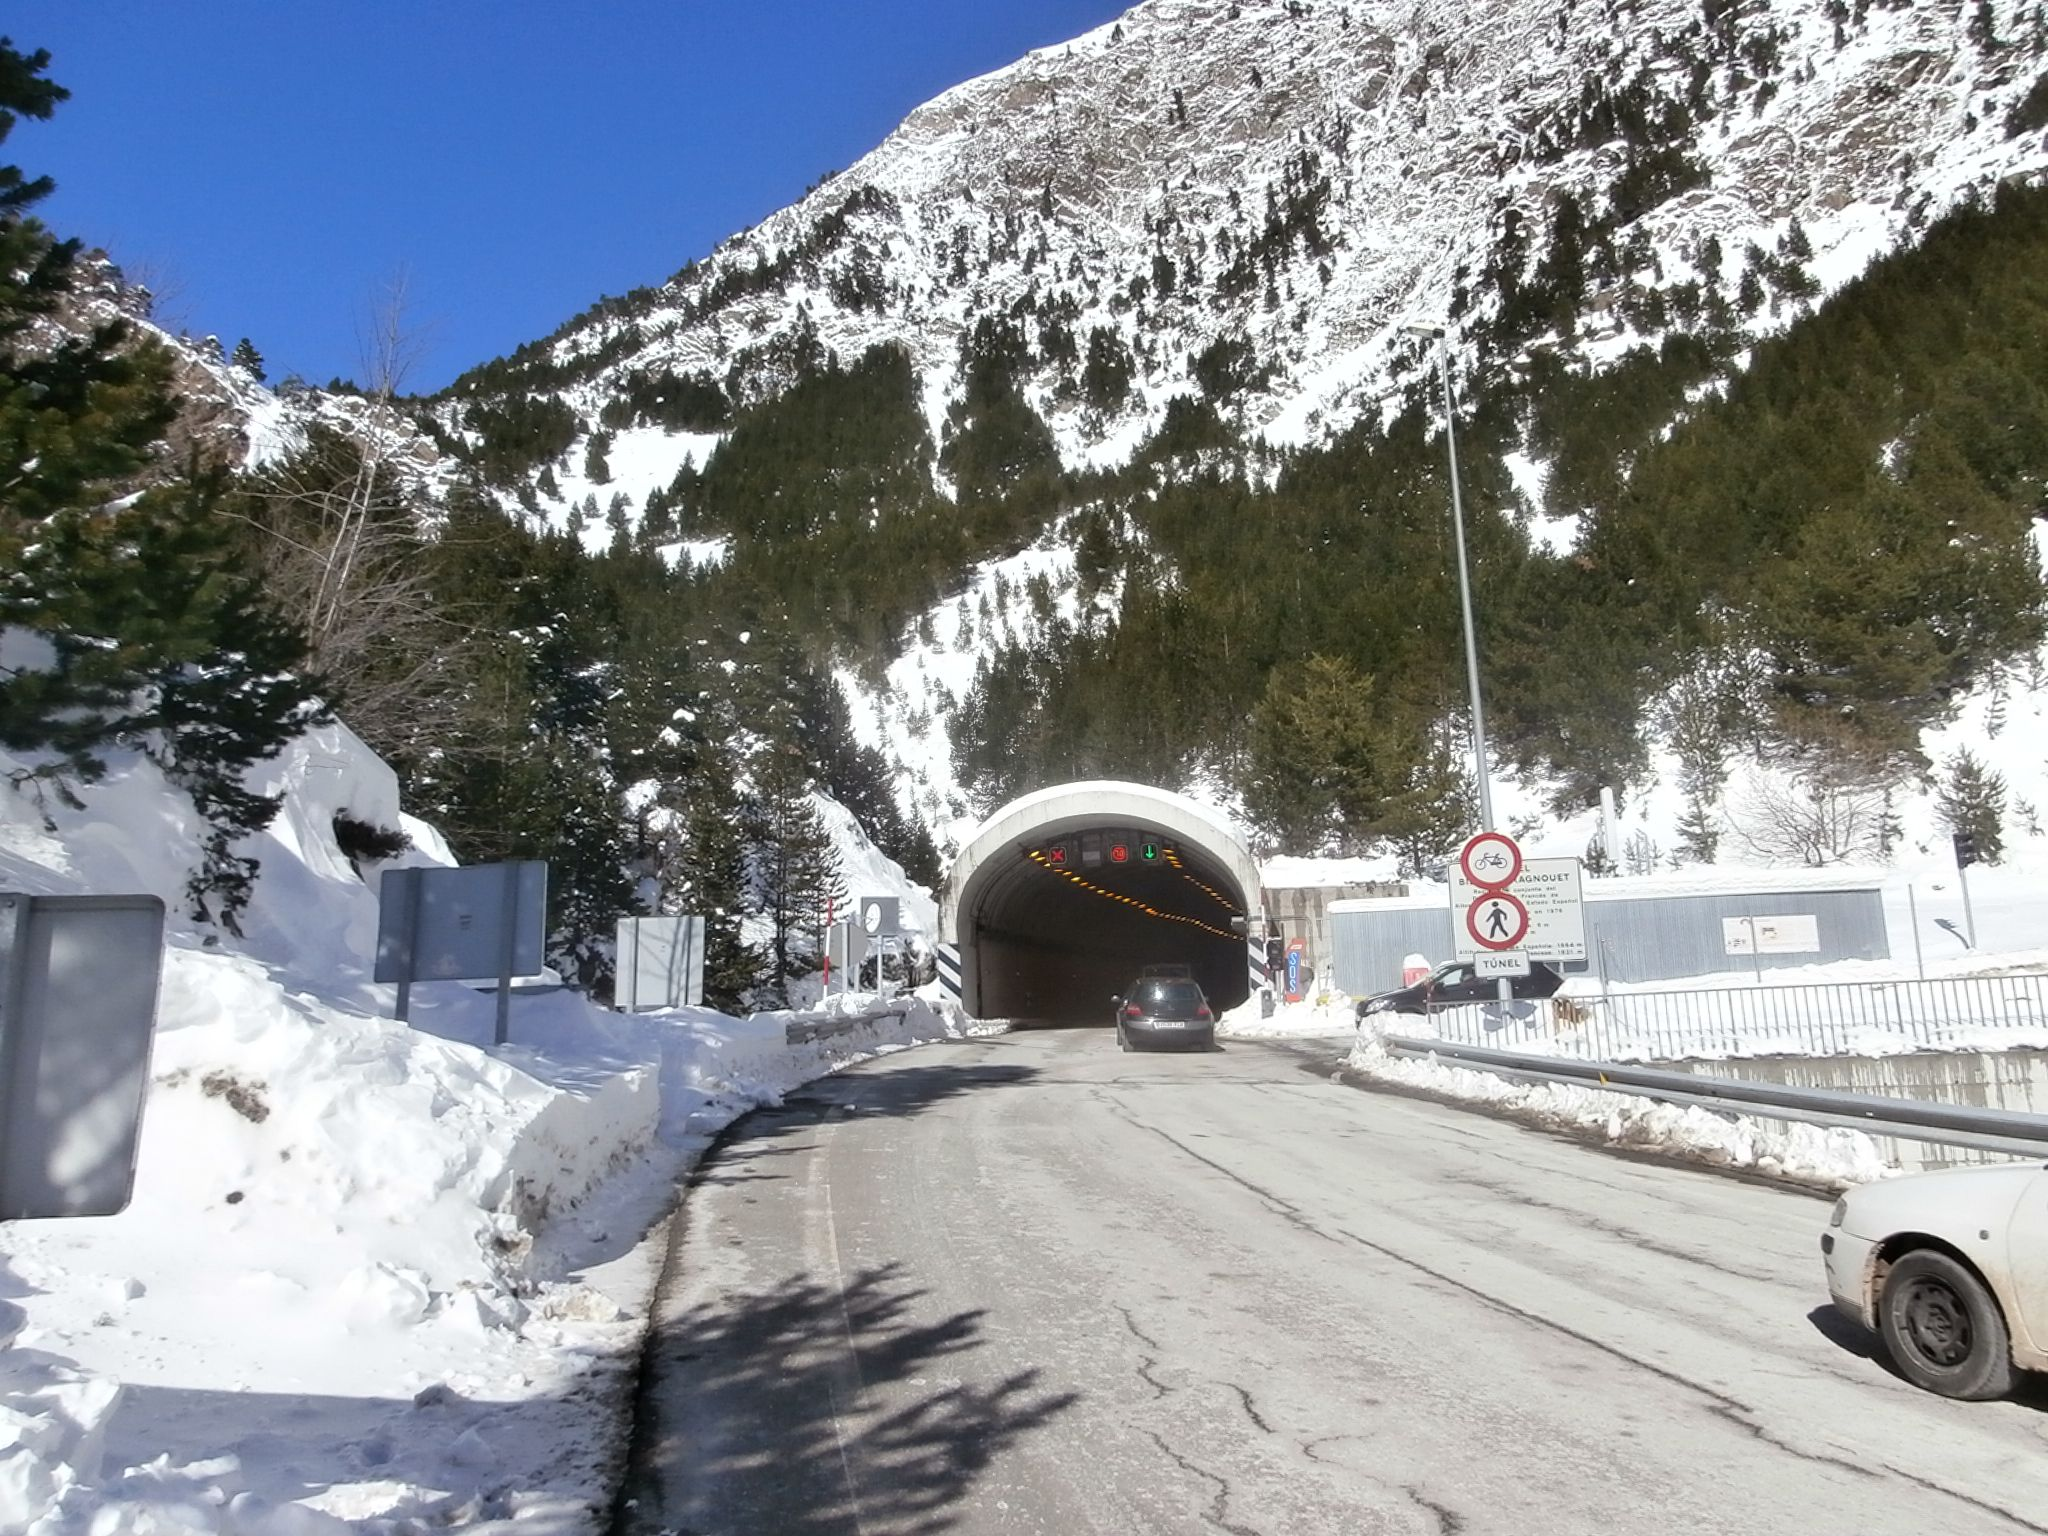 Imagen de archivo del túnel de Bielsa-Aragnouet. Foto: SobrarbeDigital